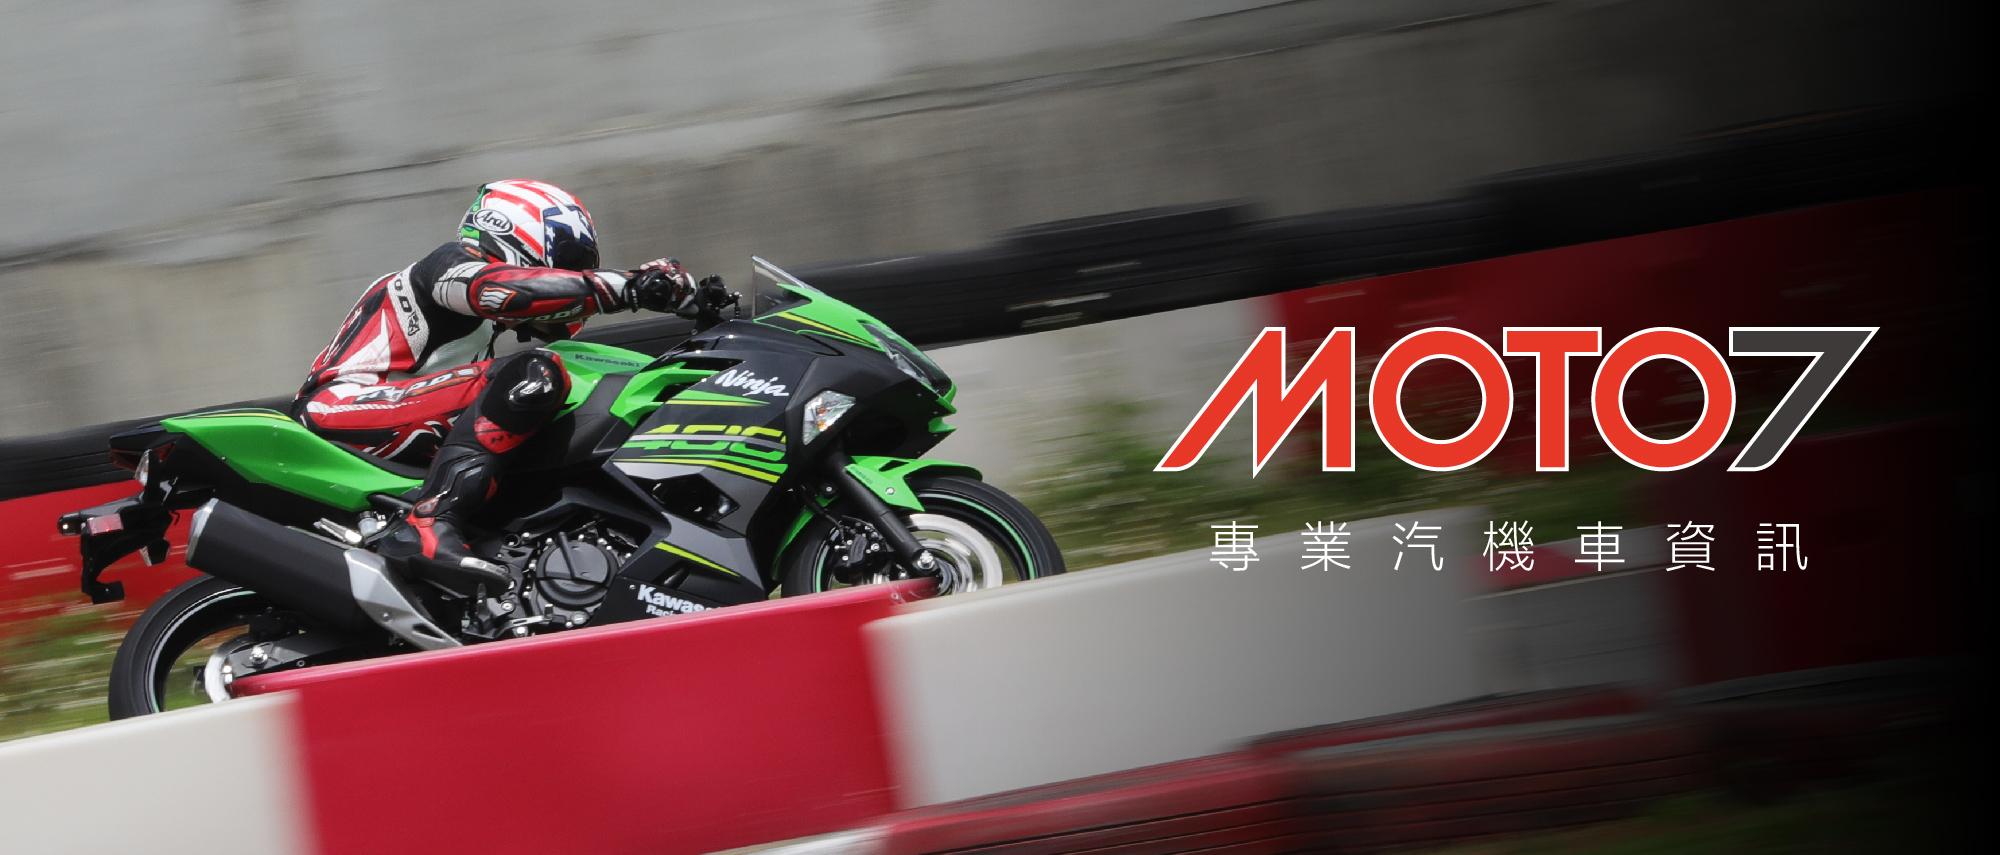 MOTO7,官網